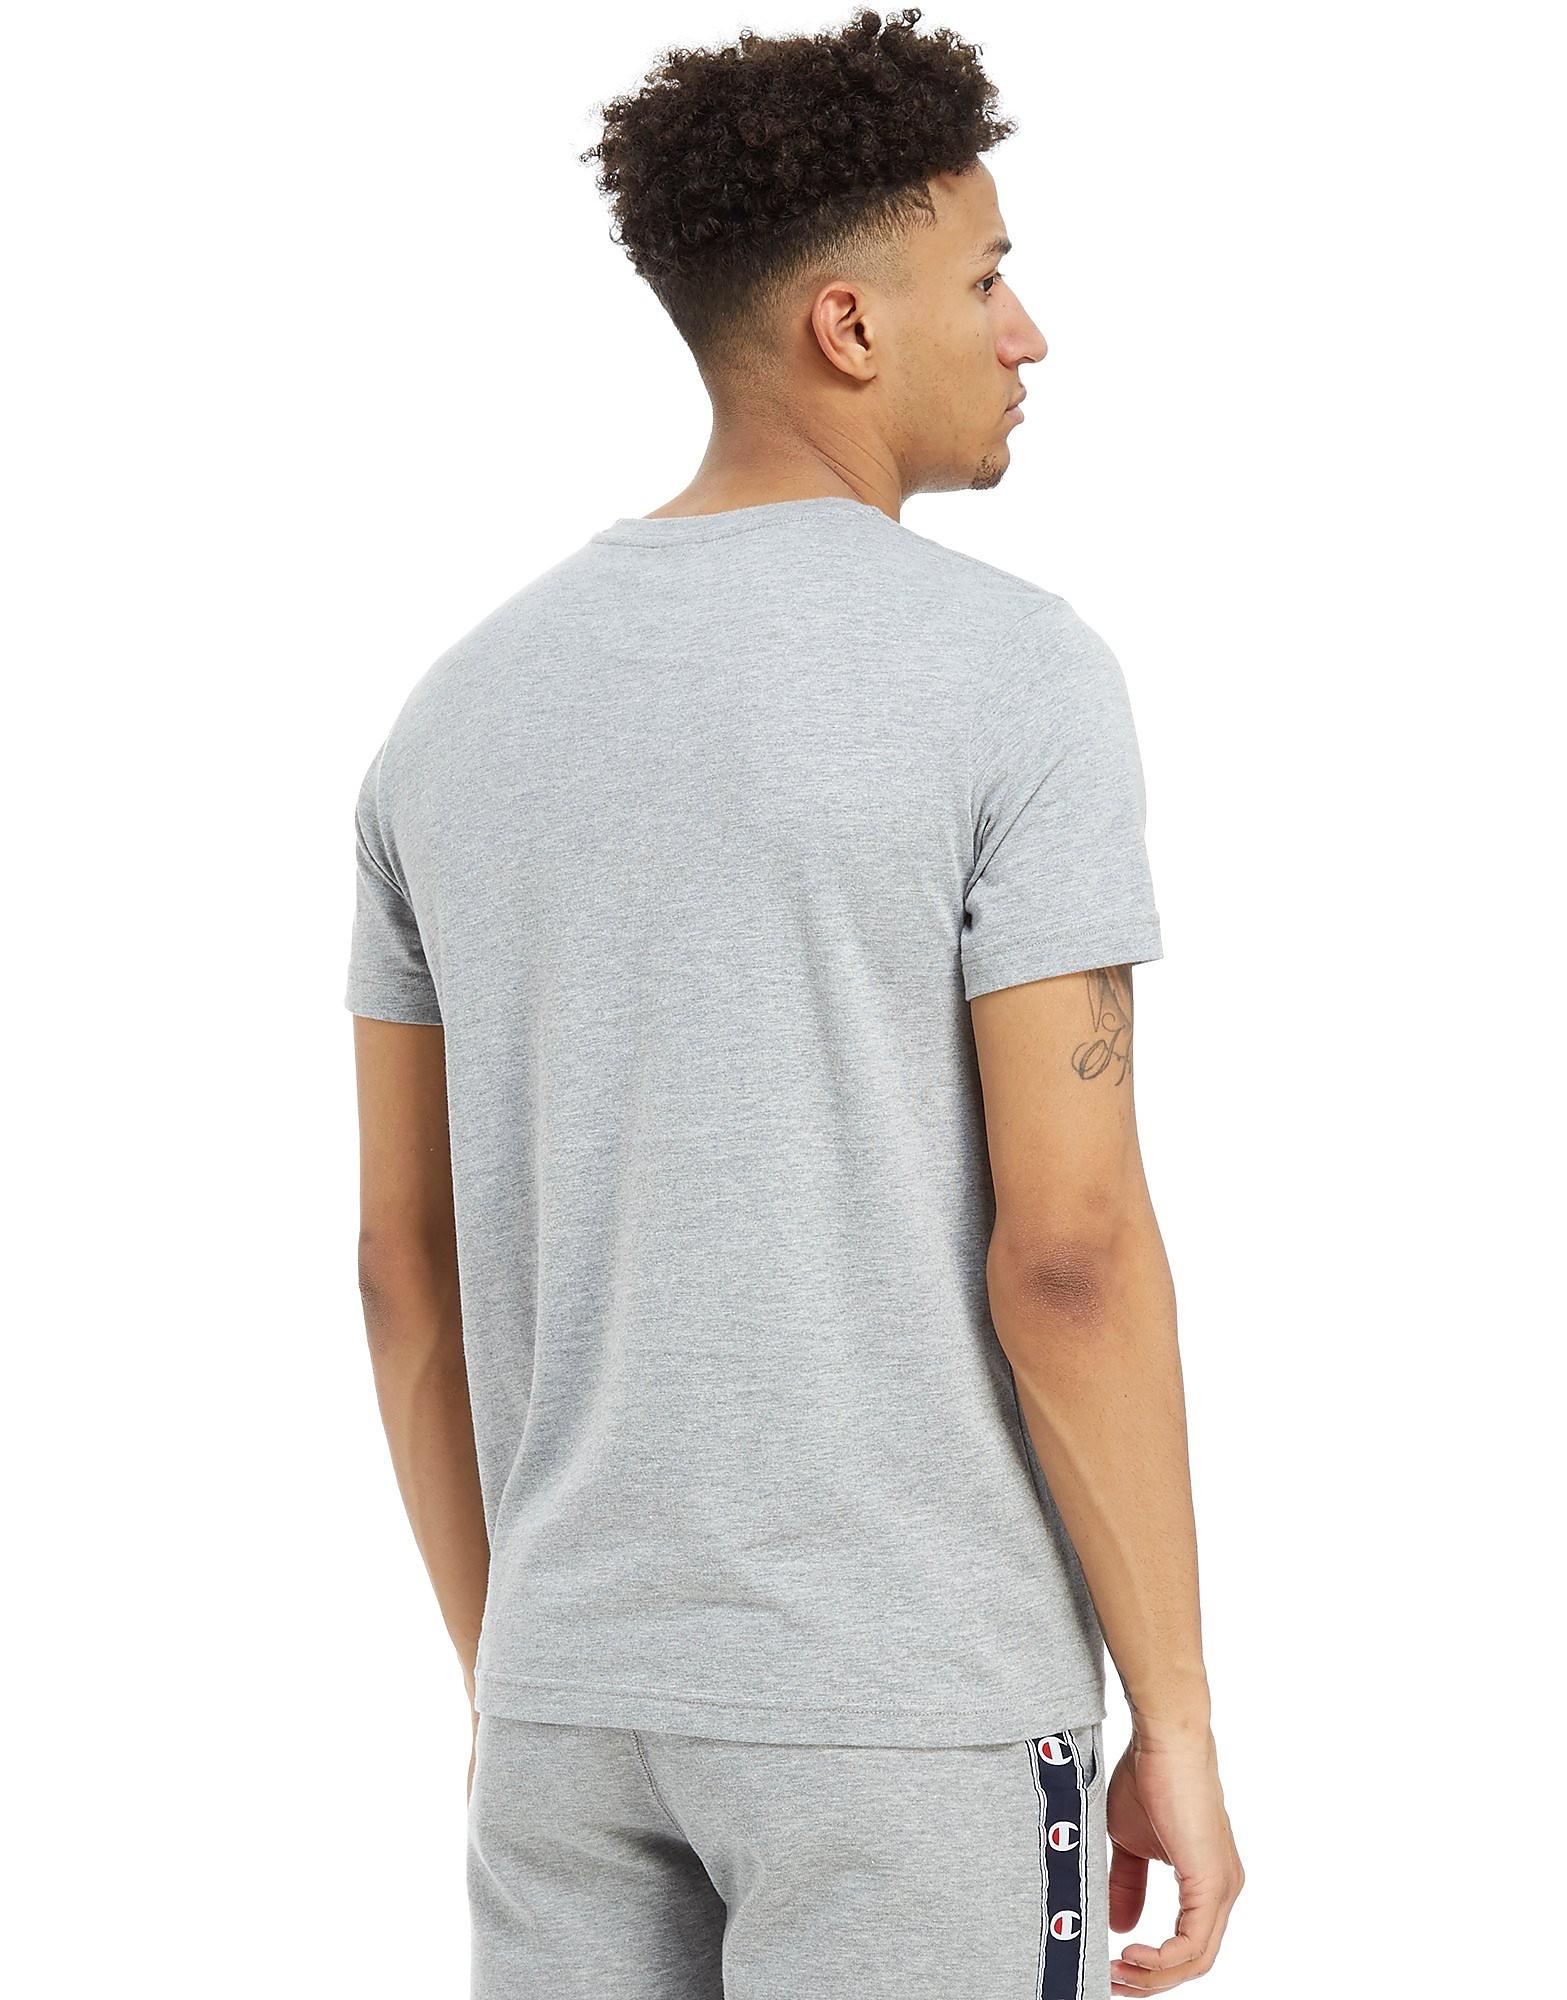 Champion T-shirt Colourblock Homme